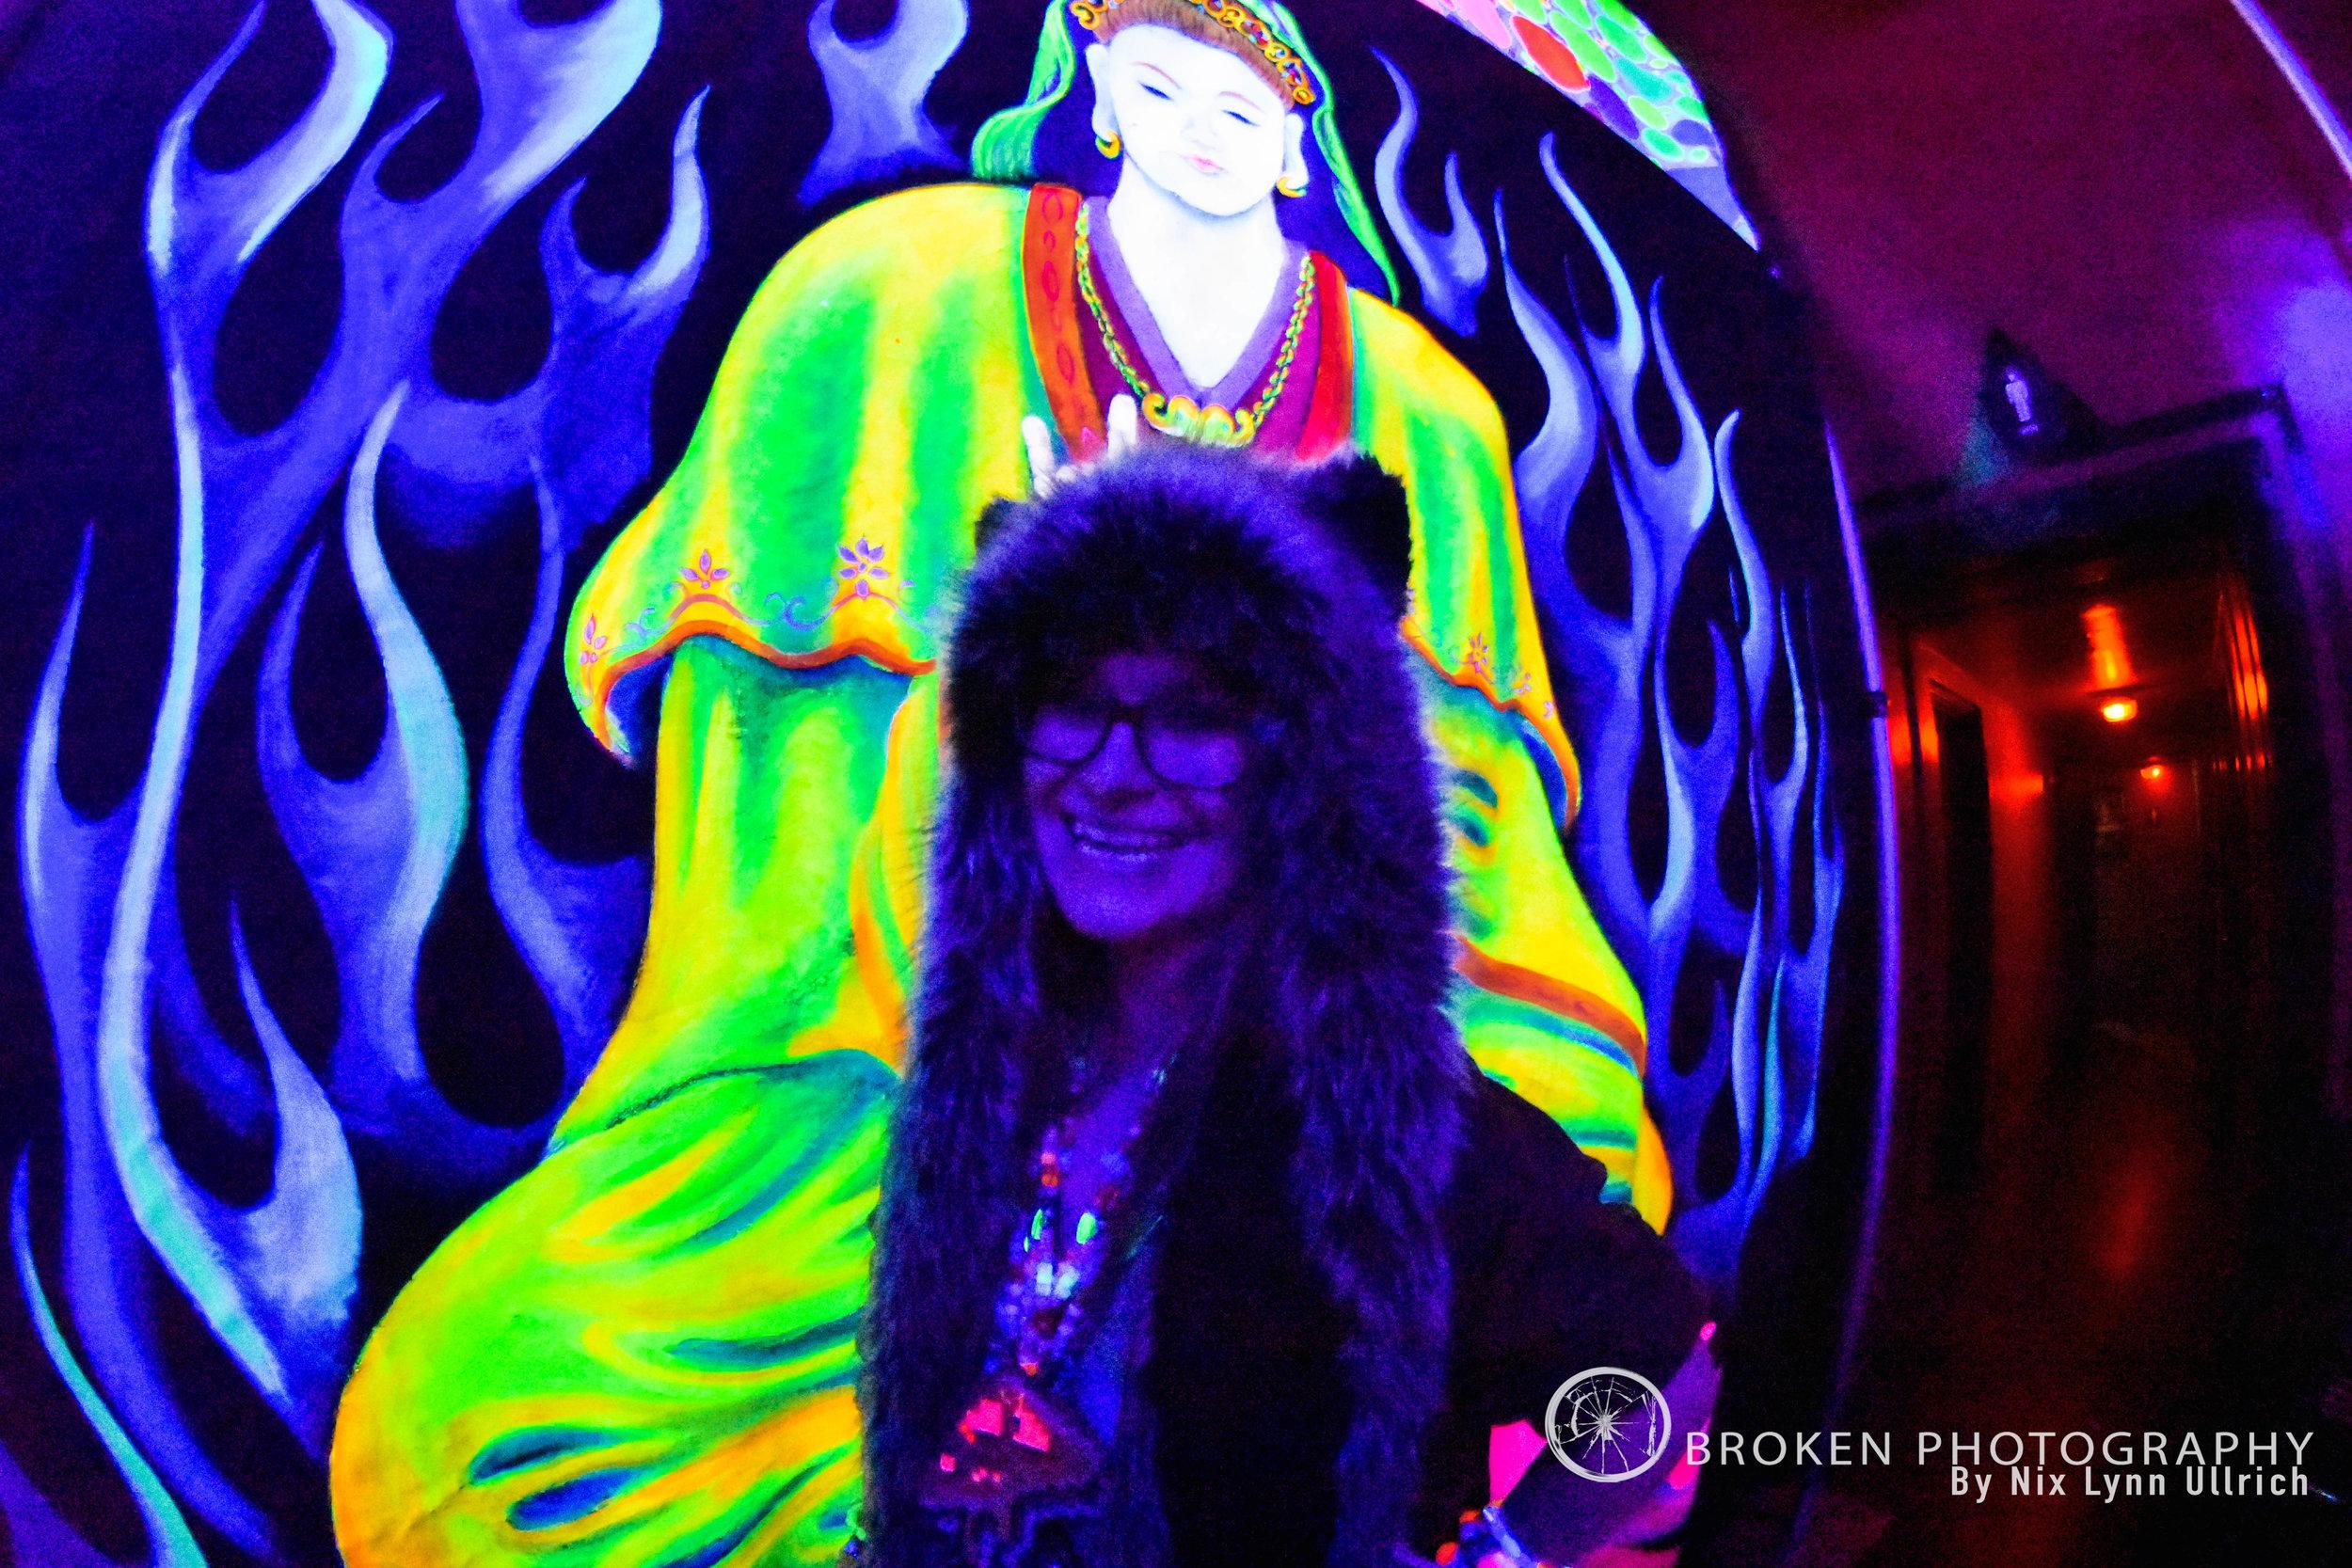 Spirit Hoods and Neon Decorations